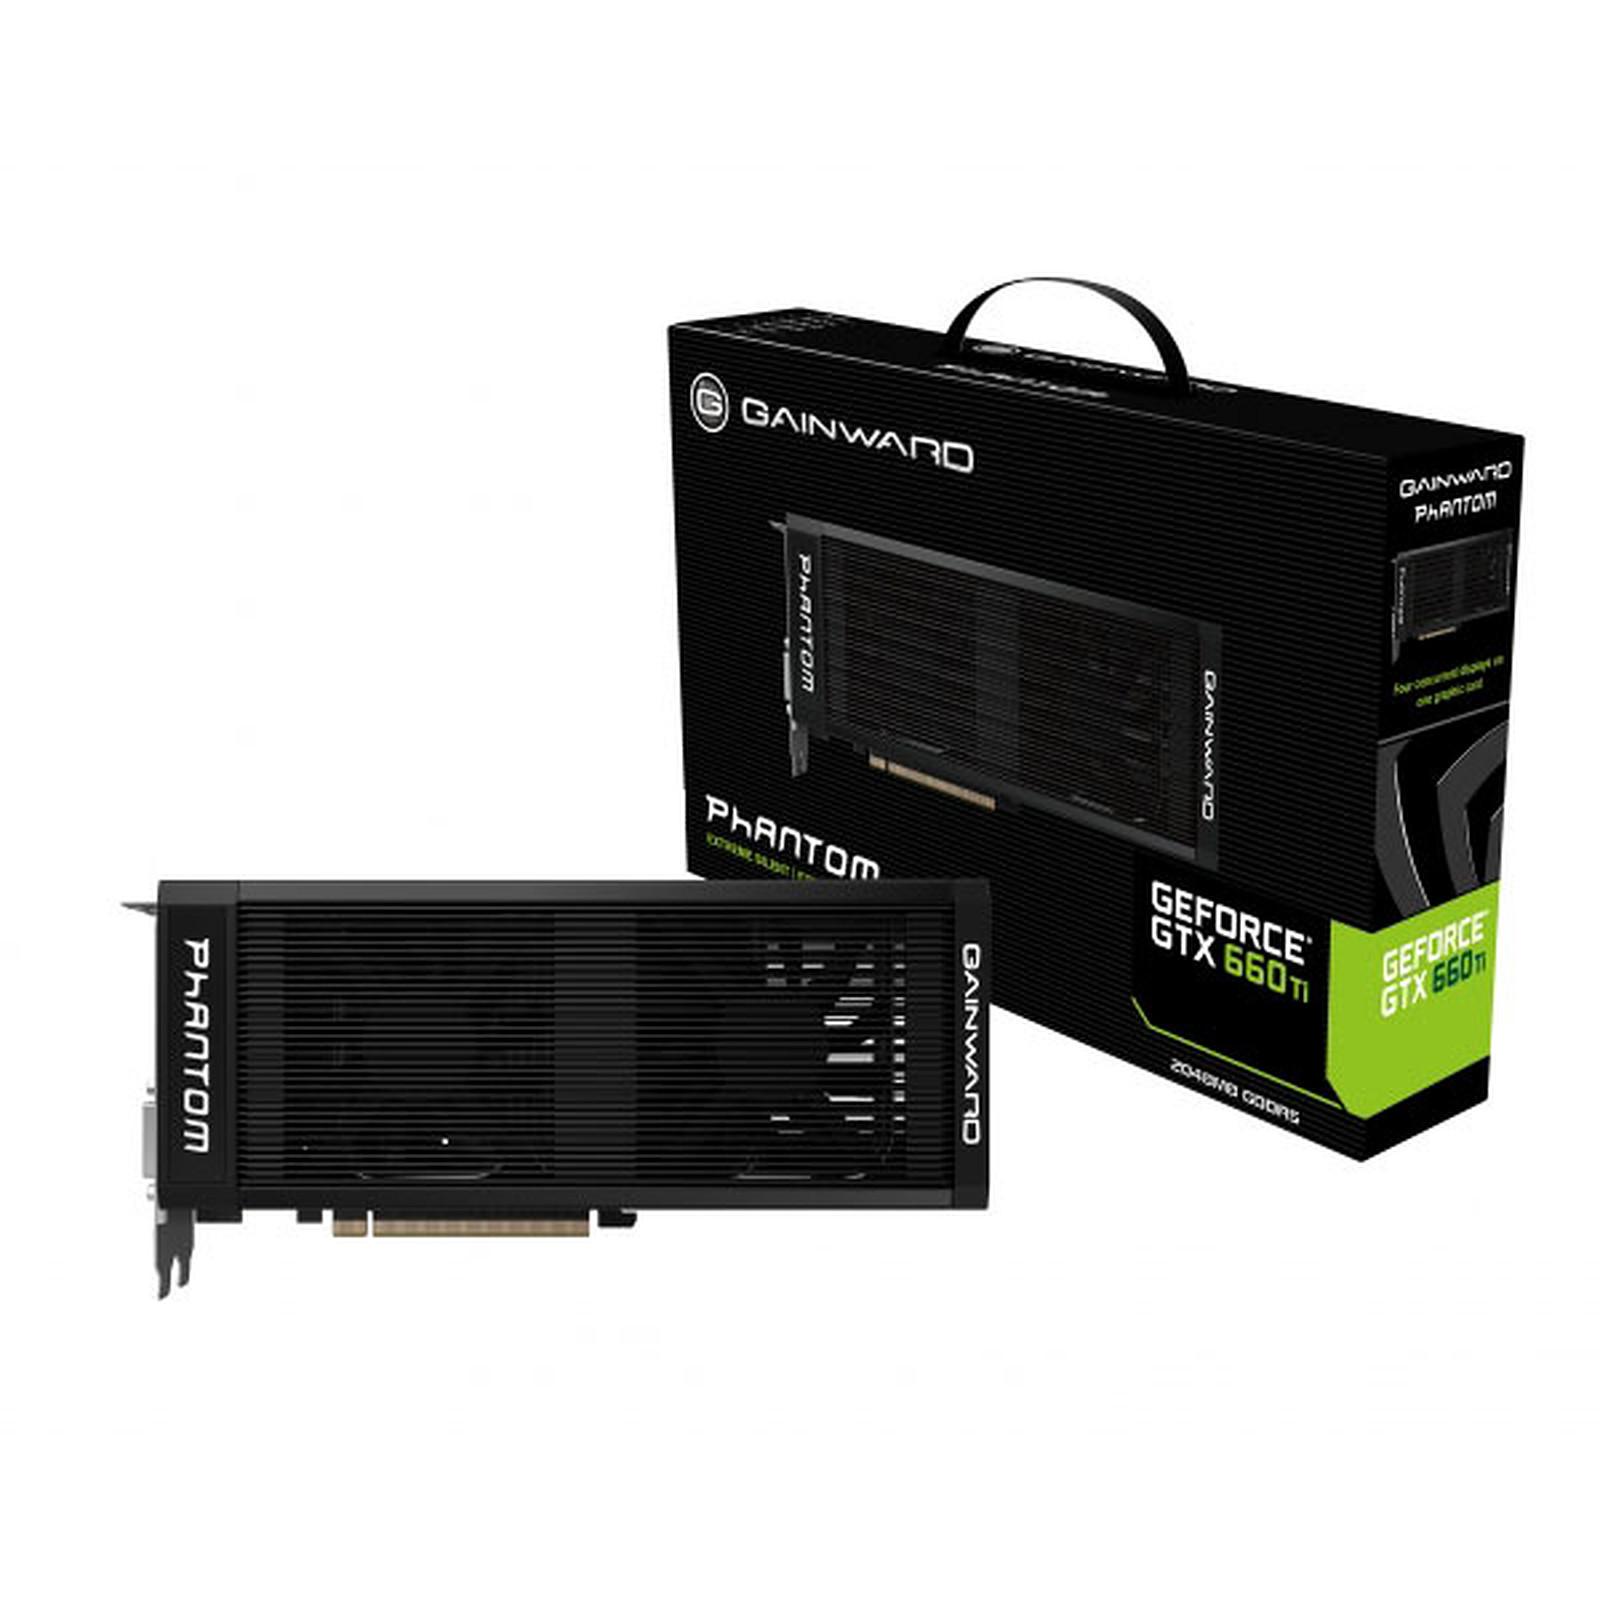 Gainward GeForce GTX 660Ti Phantom 2GB